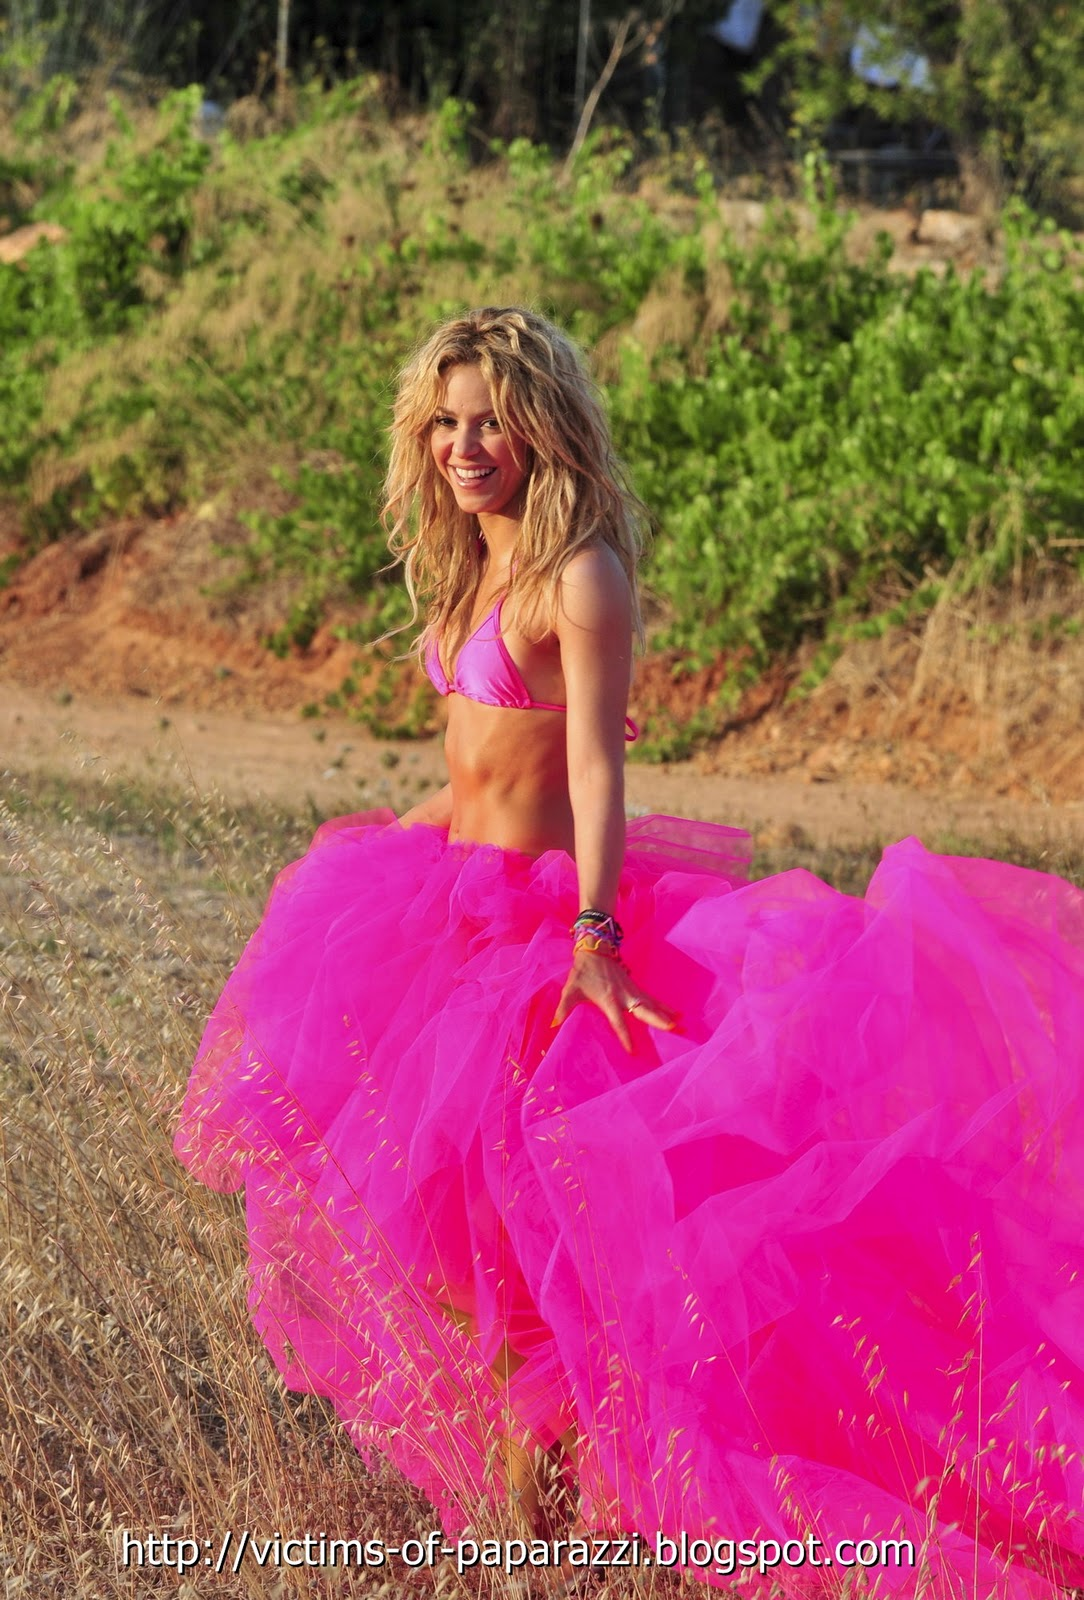 http://1.bp.blogspot.com/_NFcDSk31Yq8/TNGB3mEYWCI/AAAAAAAAAZ4/PYWFtnmownw/s1600/Shakira%2B%E2%80%93%2BPink%2BBikini%2BPhotoshoot%2B4.jpg